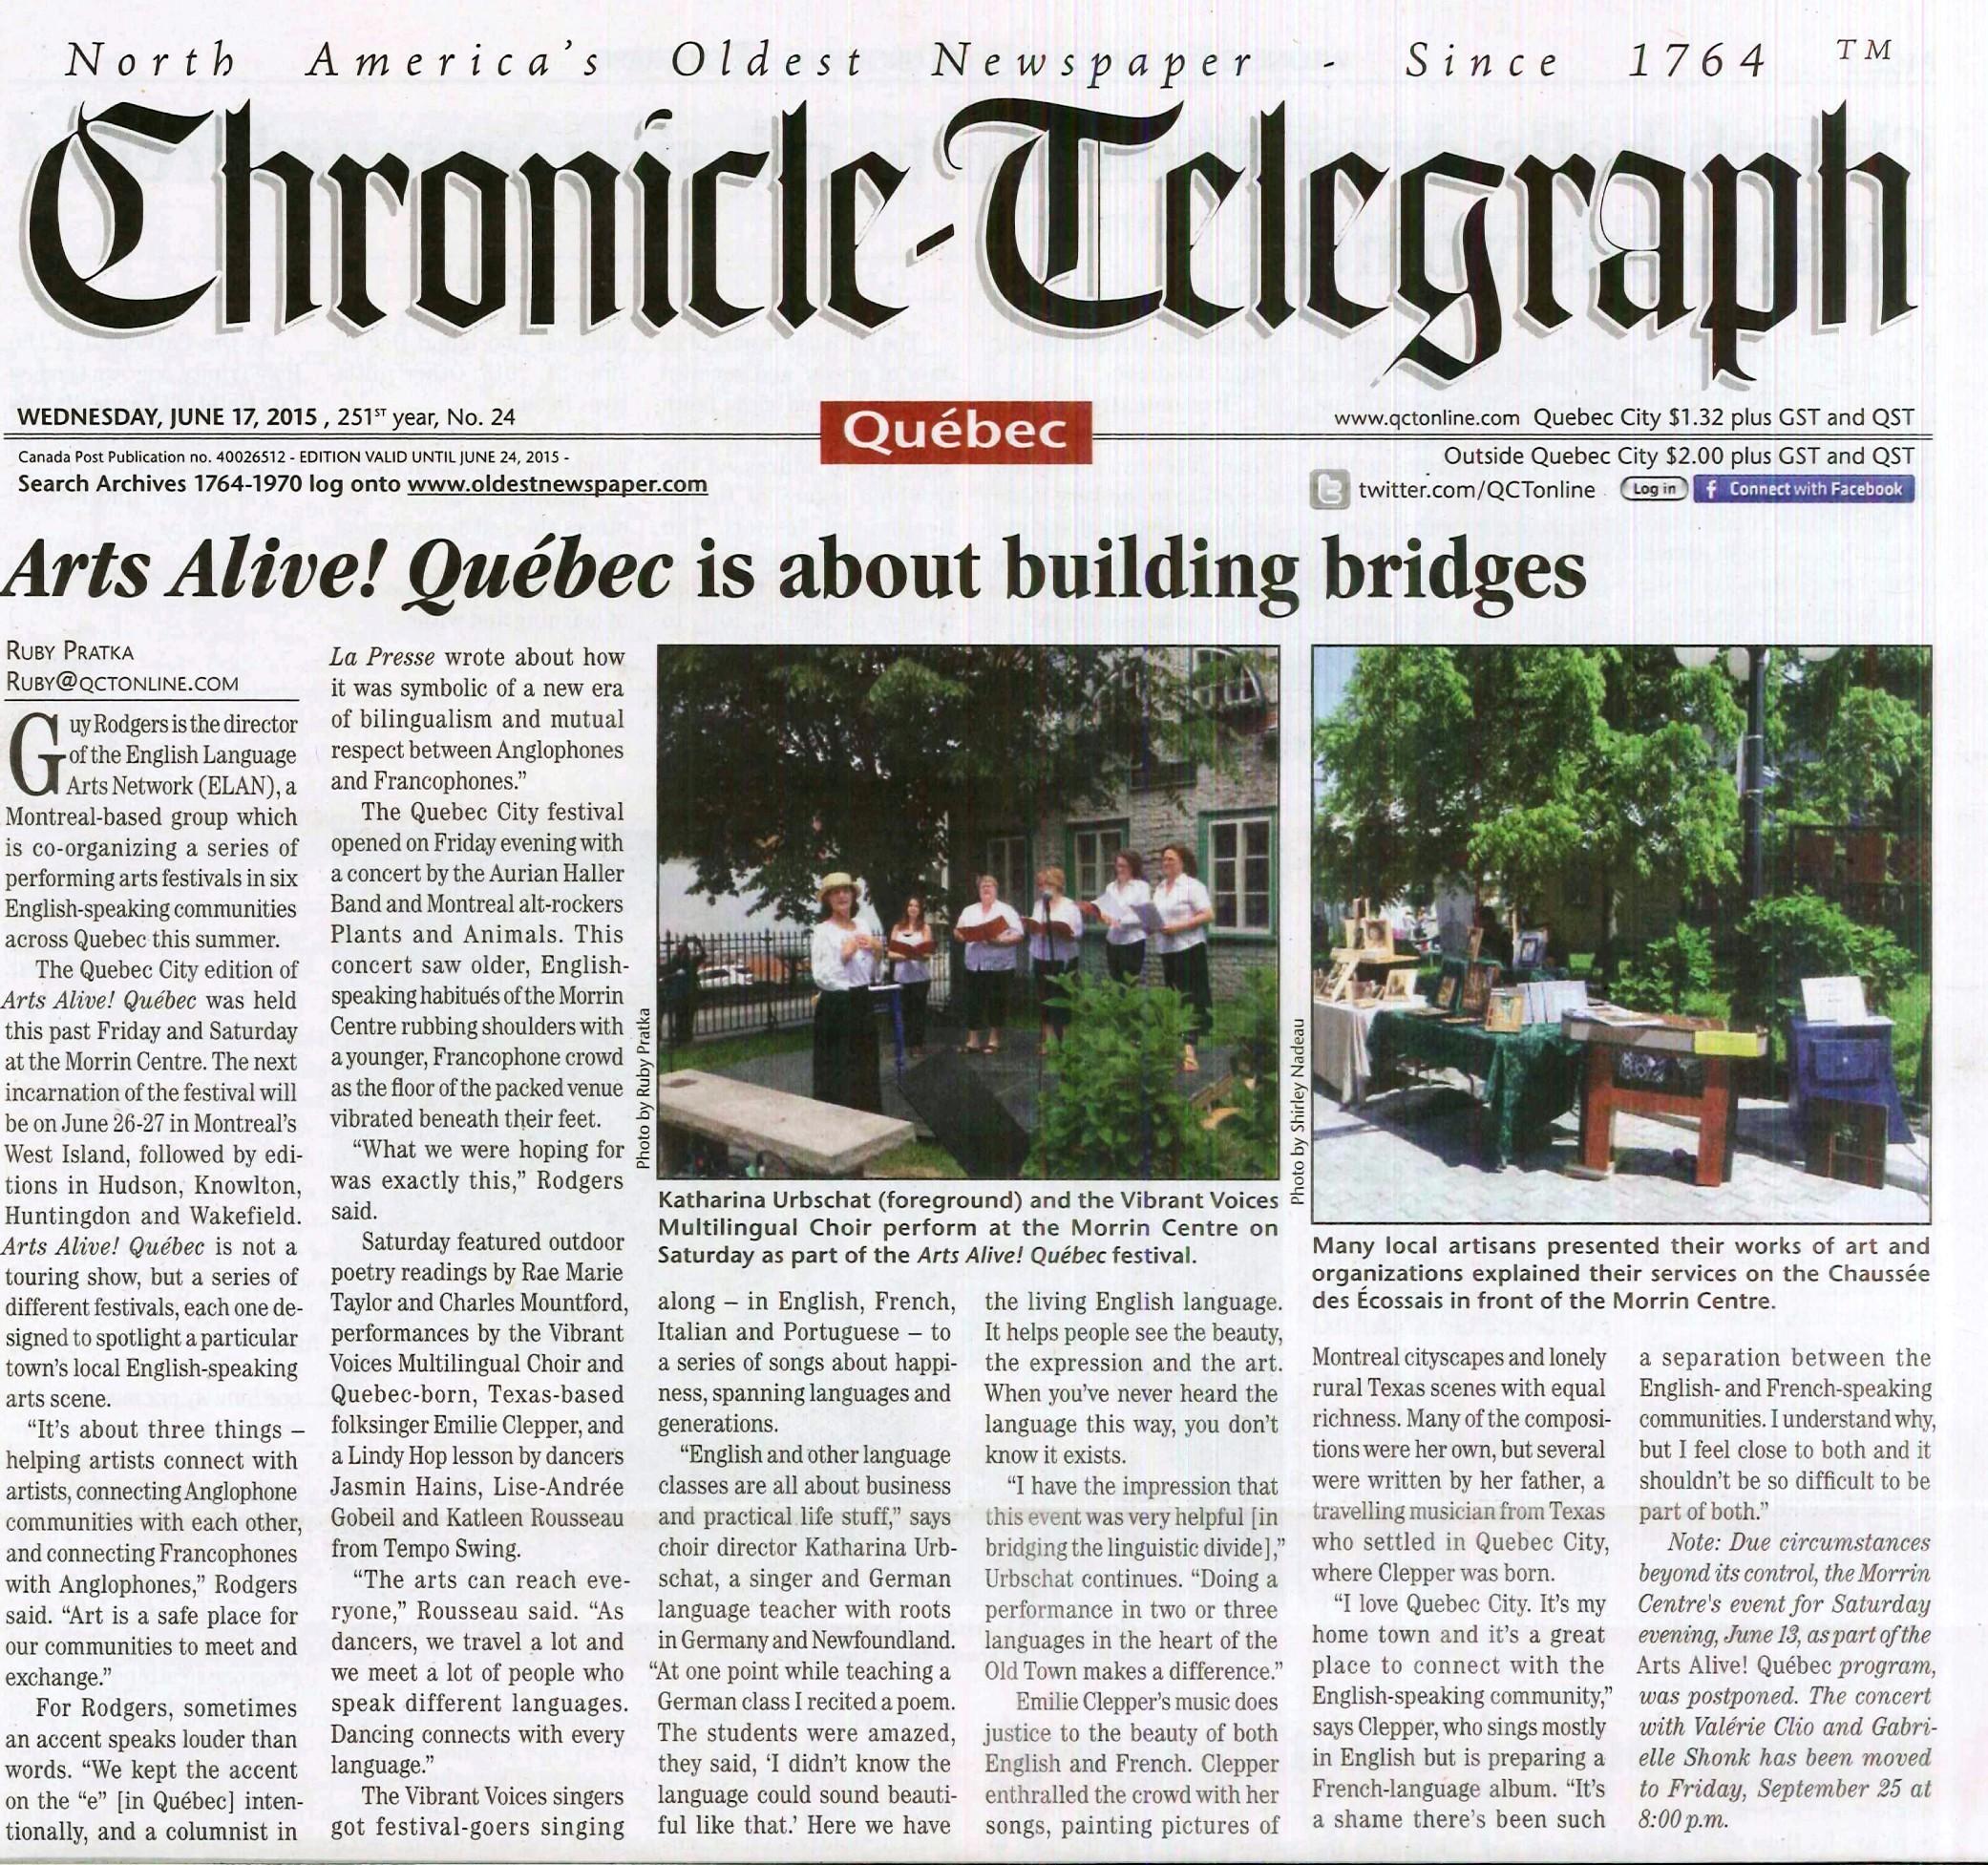 AAQ- Chronicle Telegraph (2015)